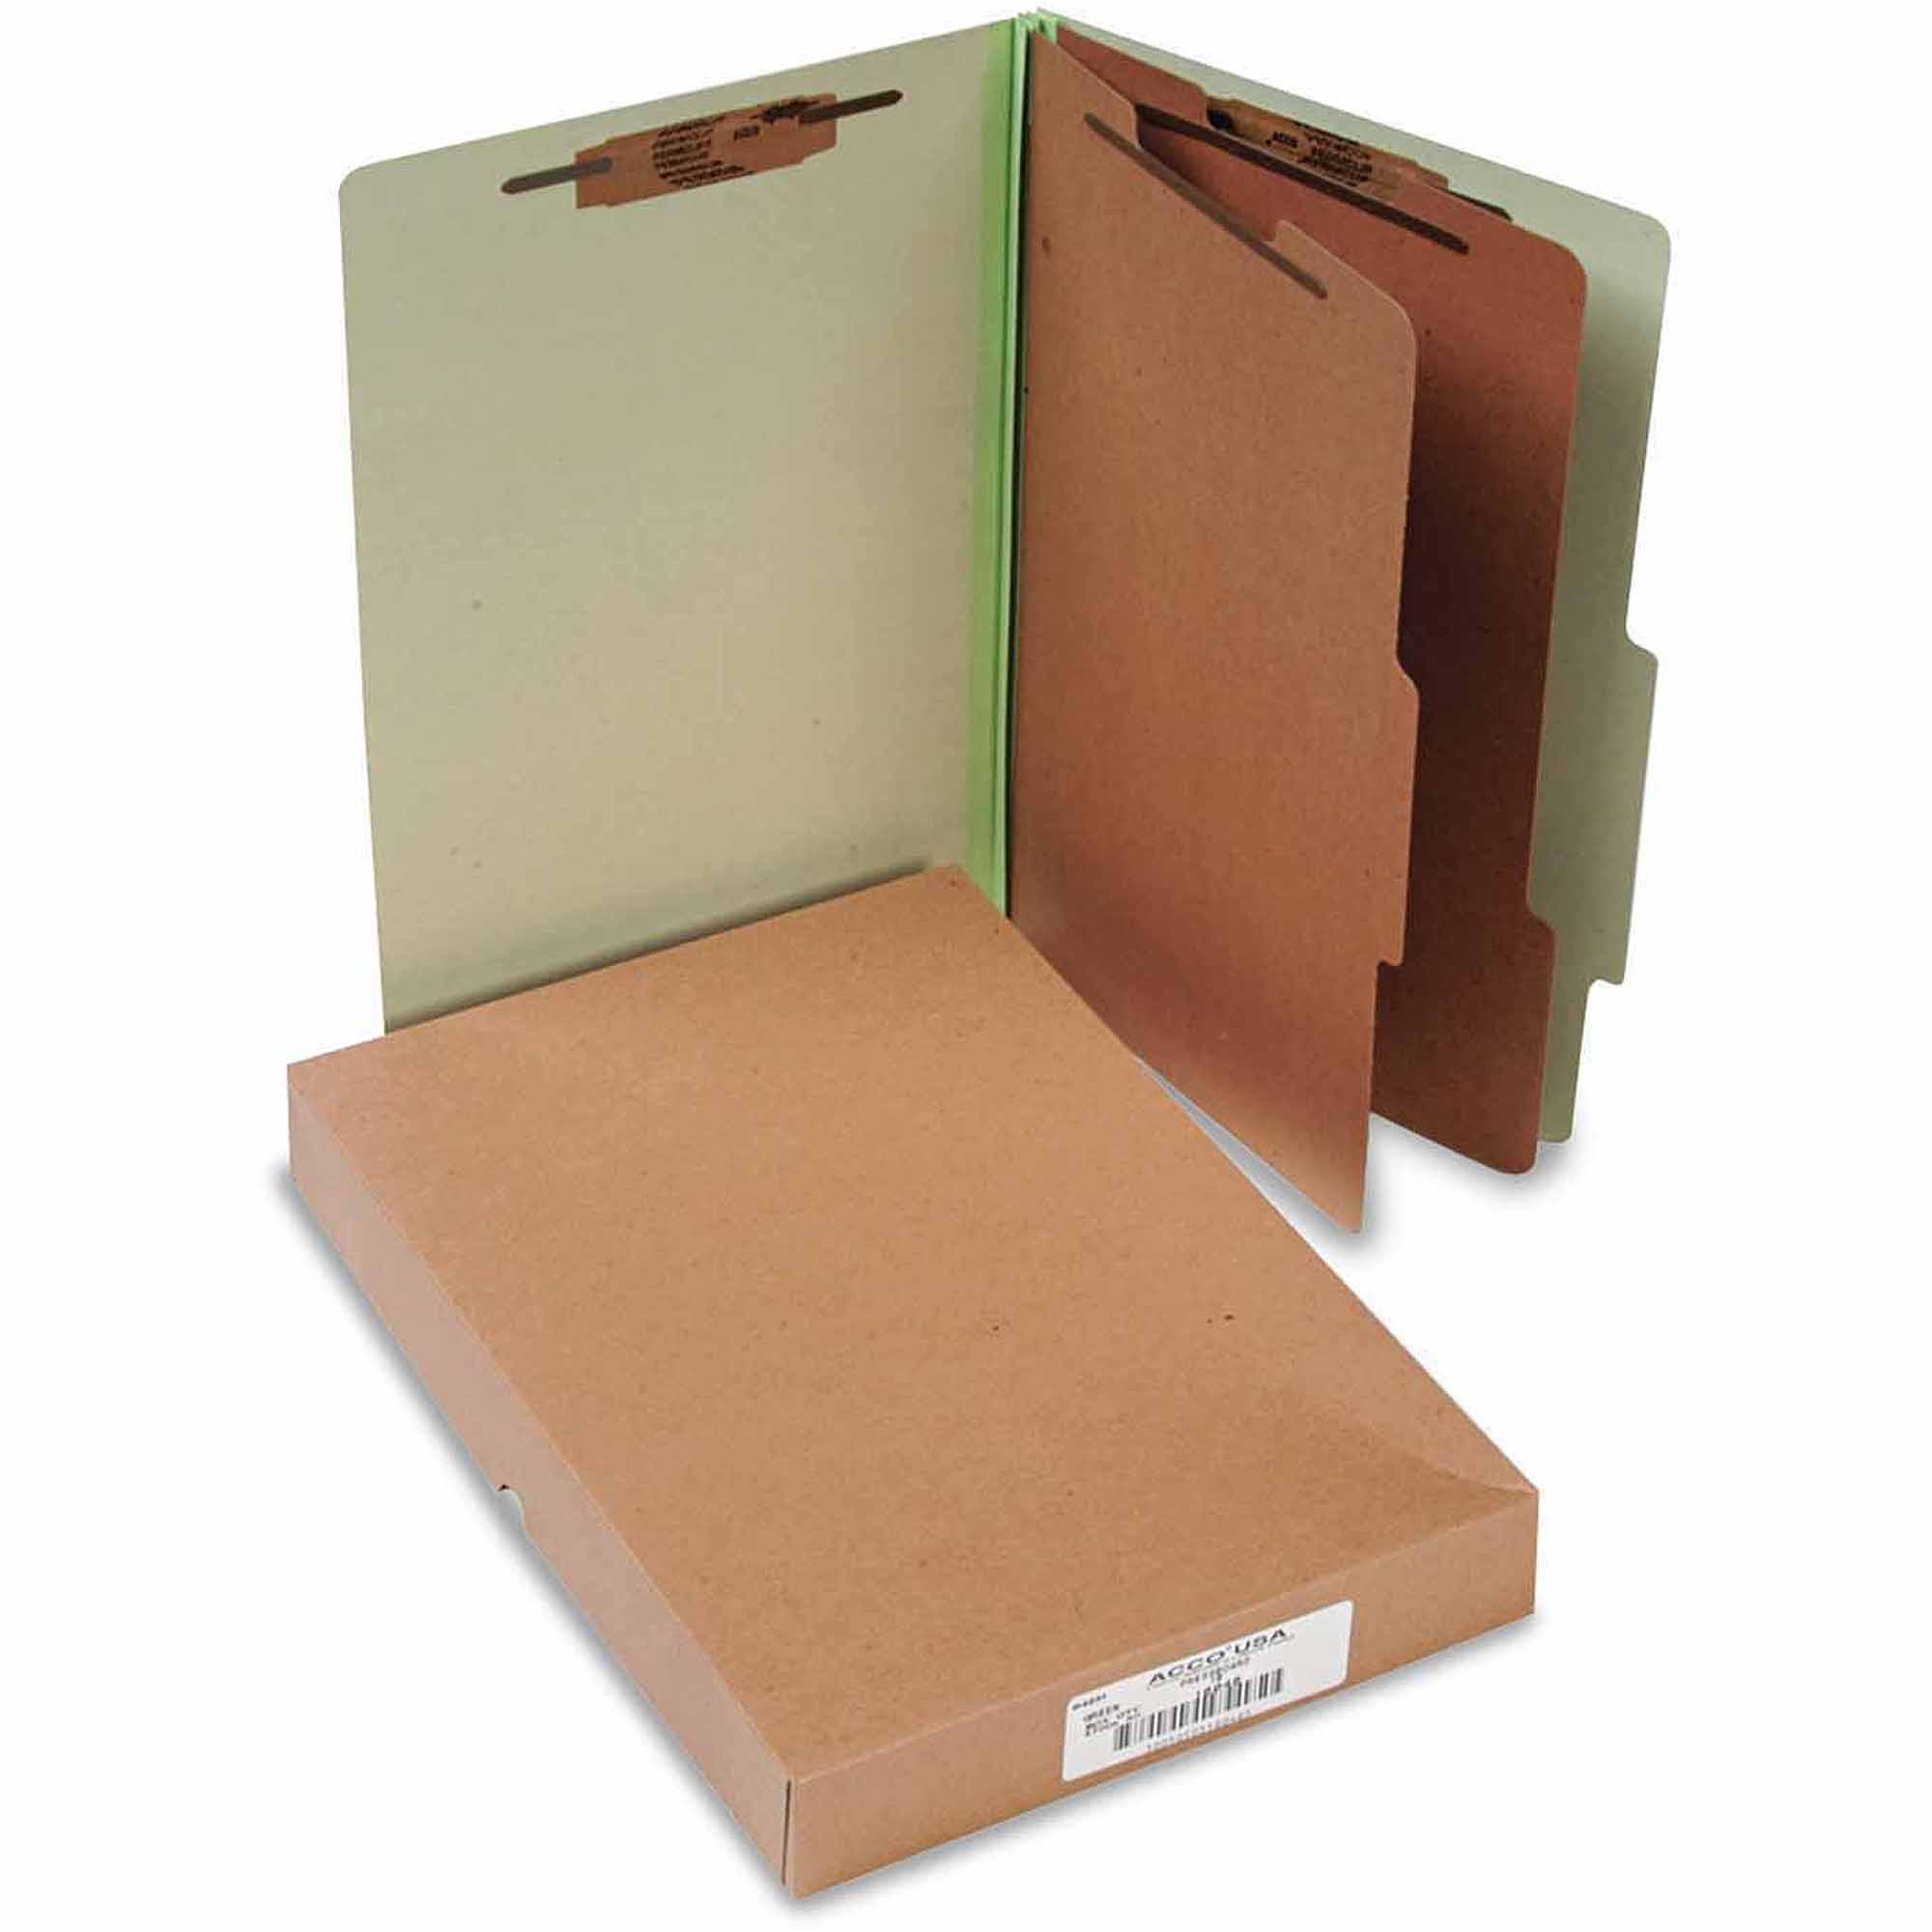 Pressboard 25-Pt Classification Folders, Legal, 6-Section, Leaf Green, 10/Box